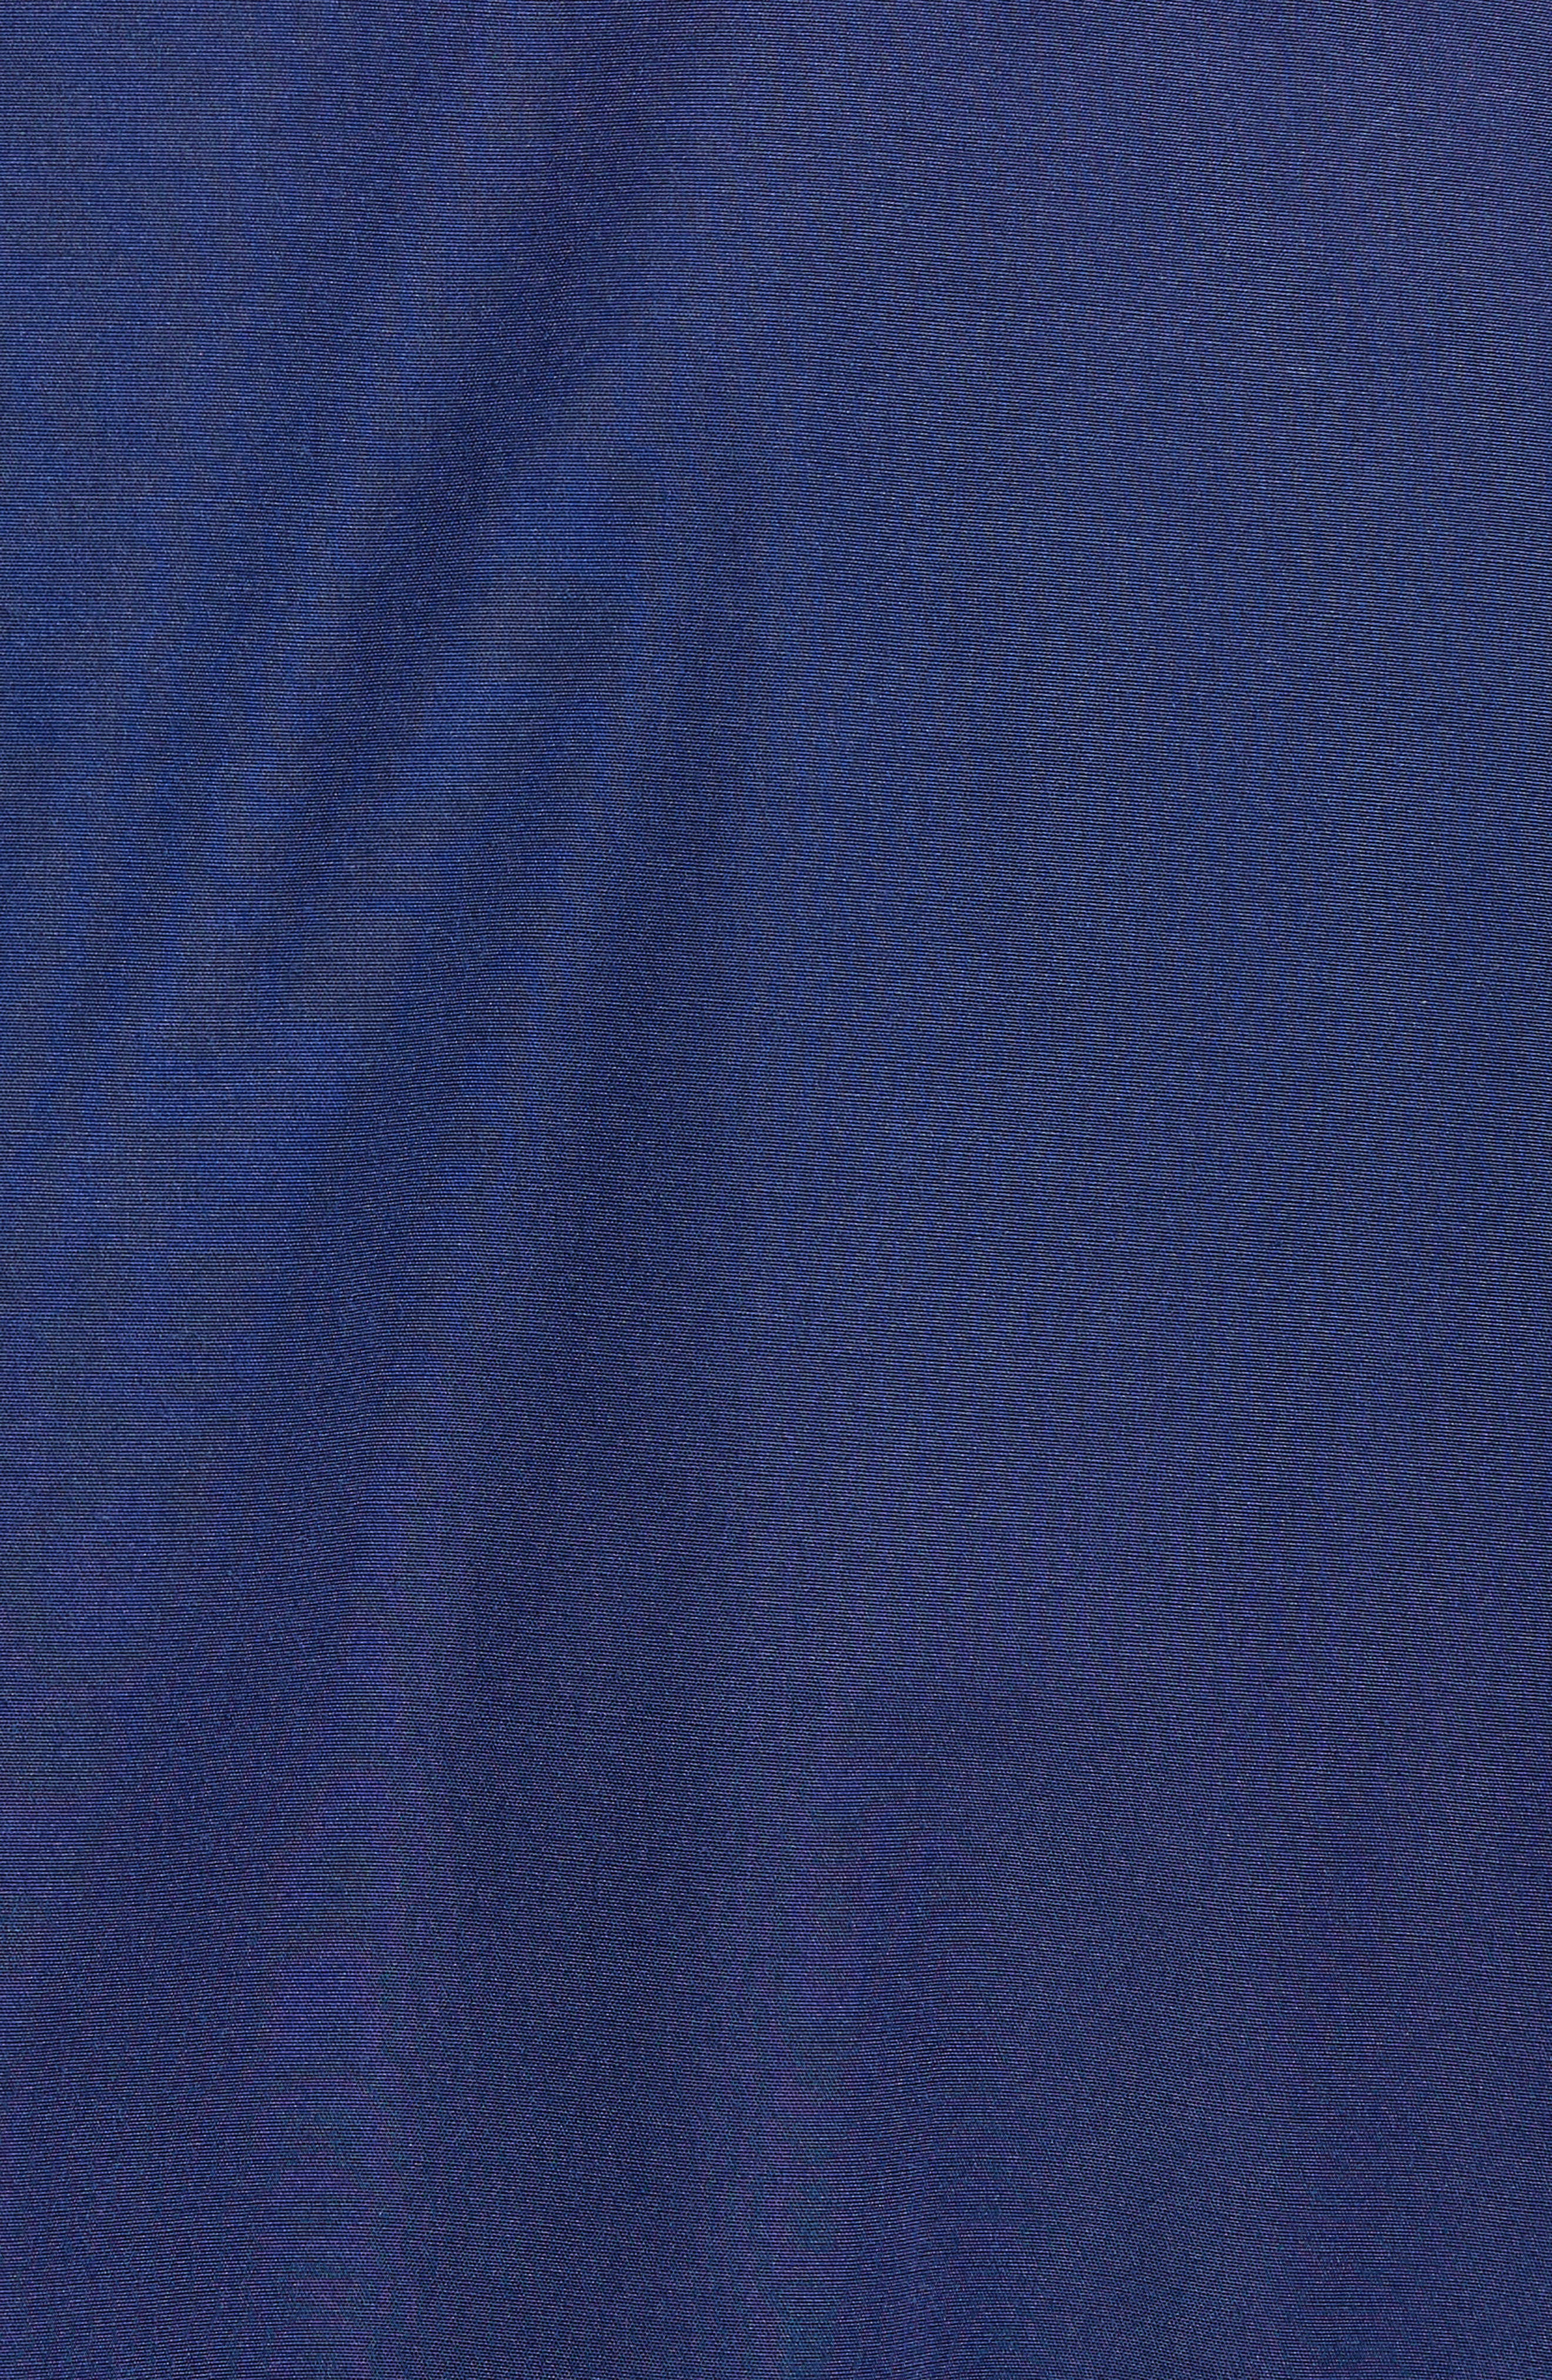 Getaway Raincoat,                             Alternate thumbnail 5, color,                             Royal Blue